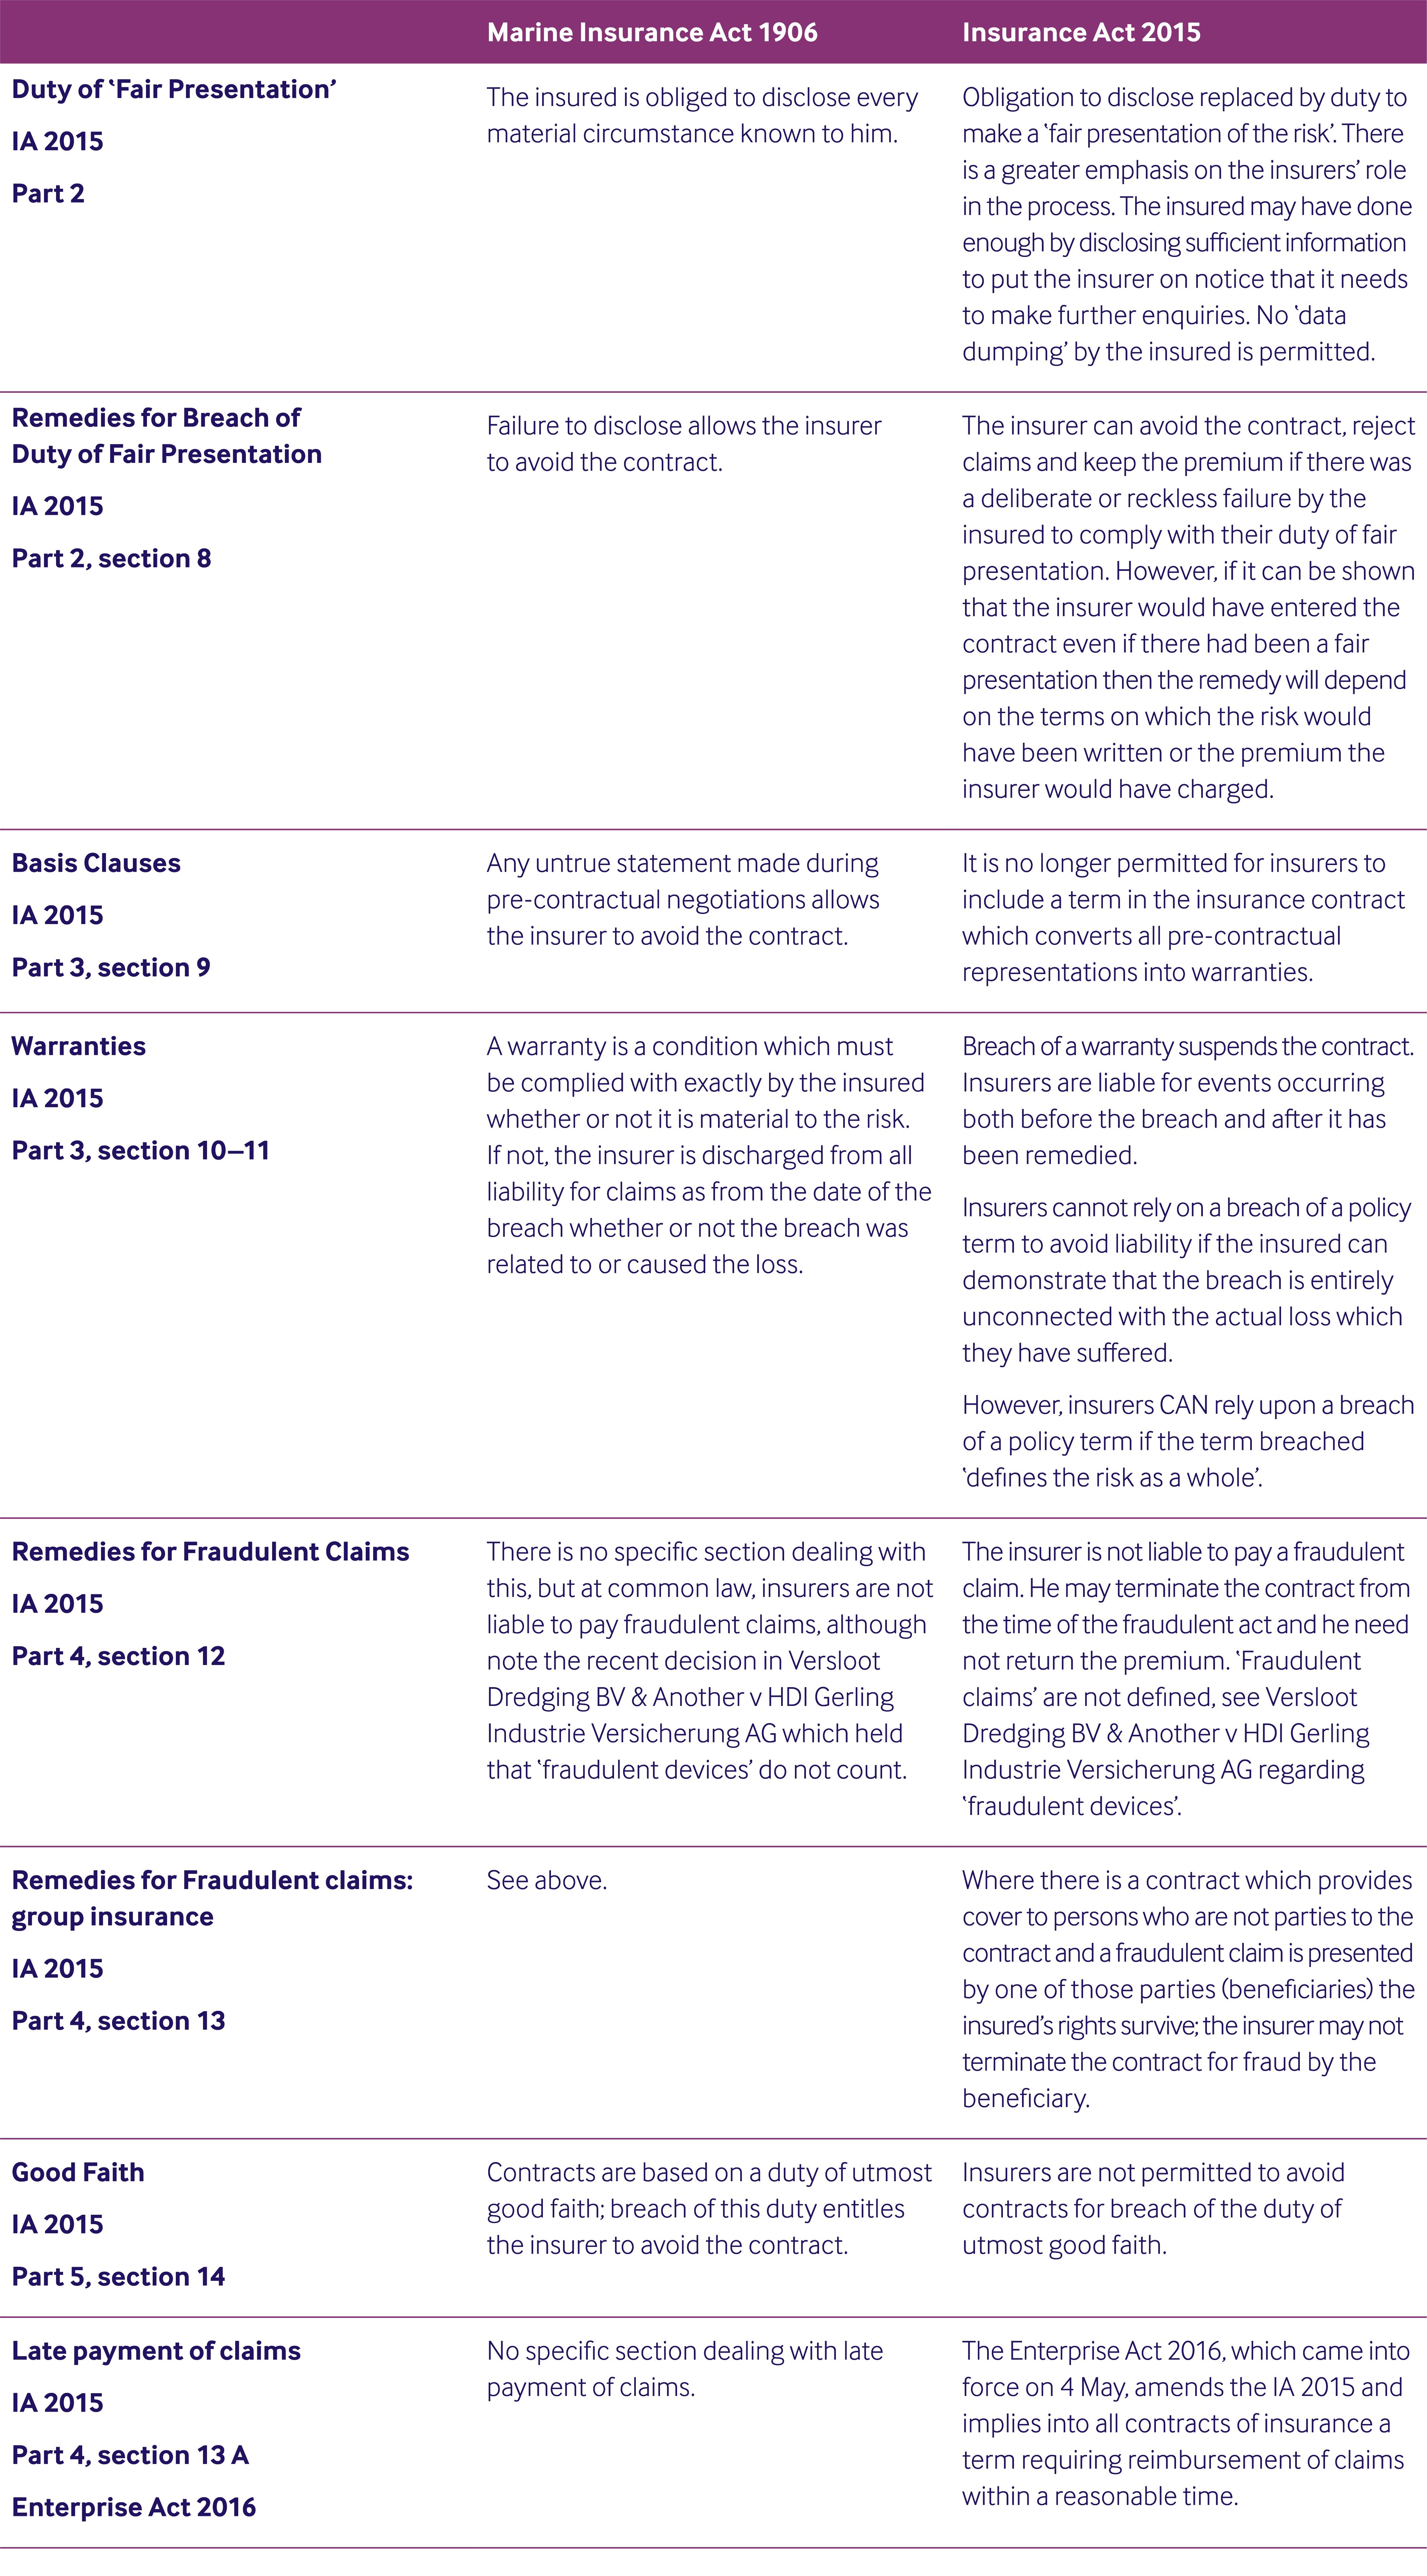 PUBS-CTRL-Insurance-Act-2015